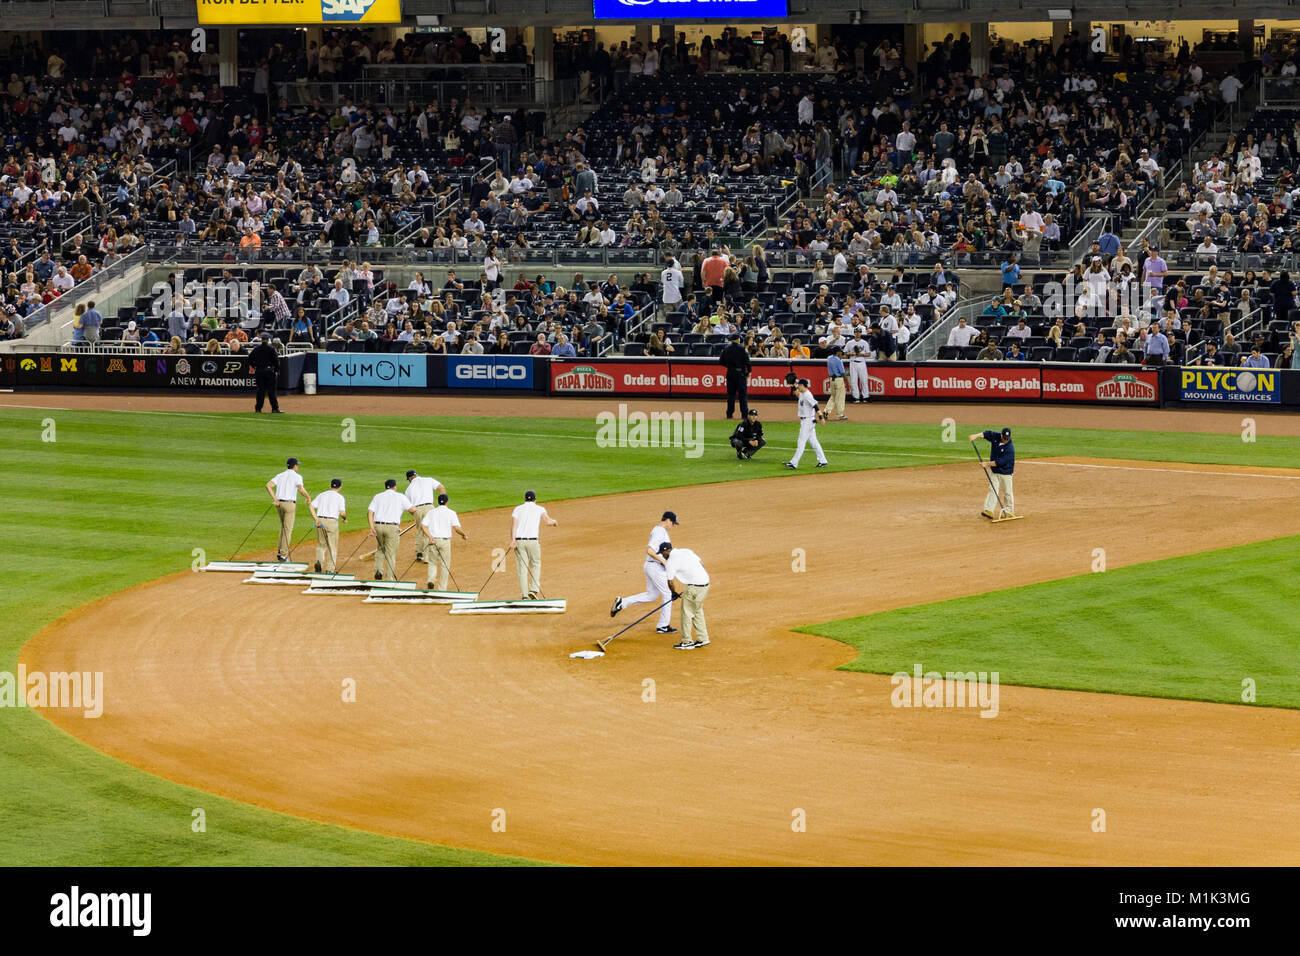 Yankees x Rockies 2014 Baseball New York City Stock Photo